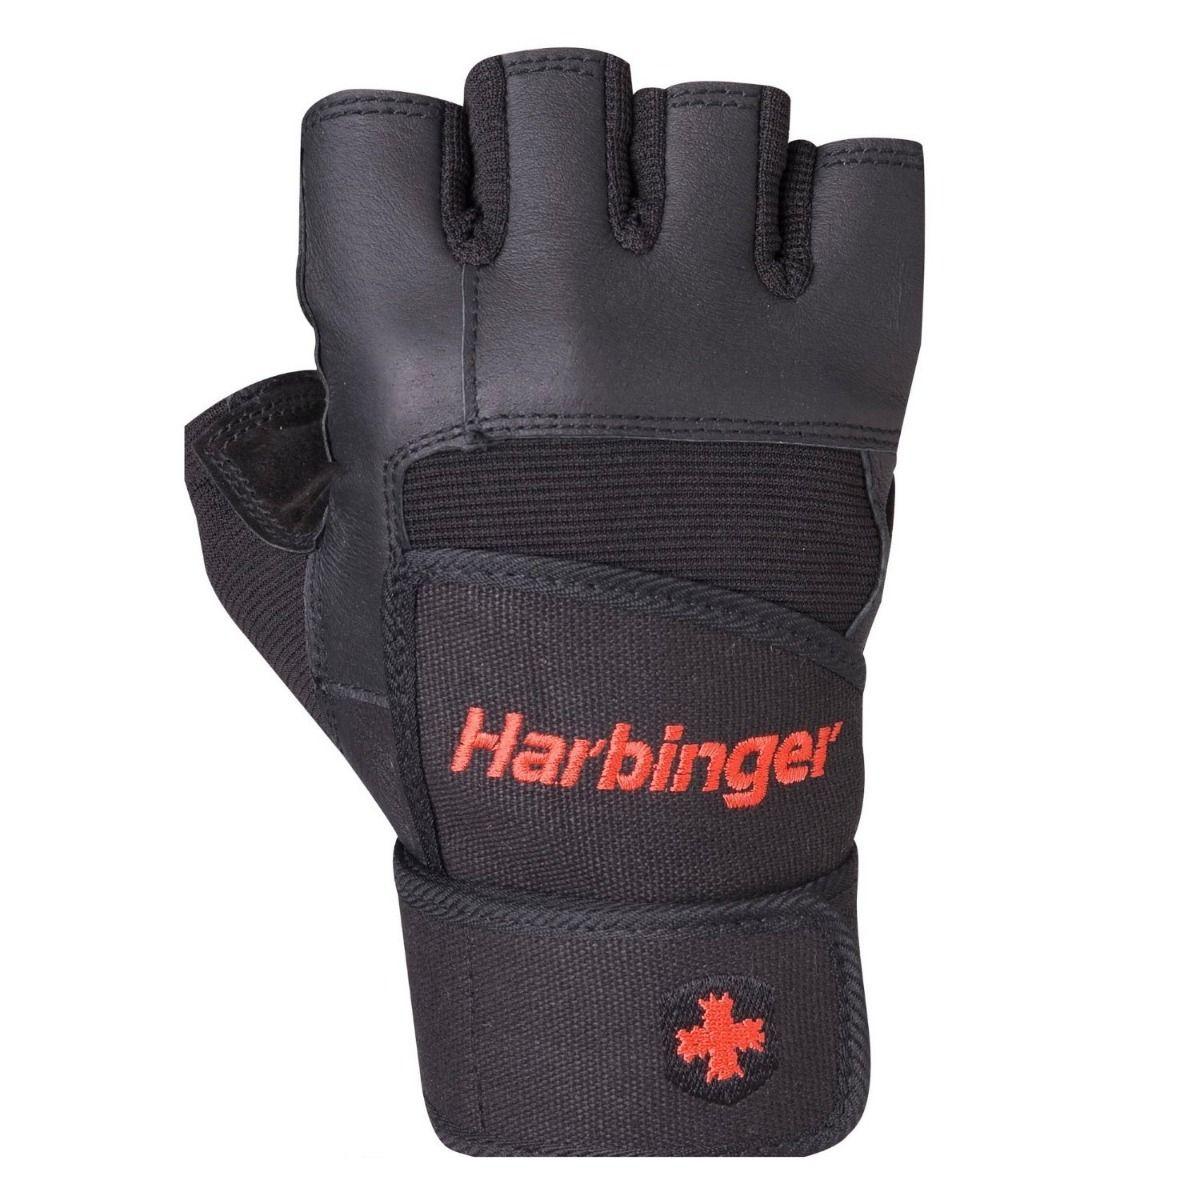 Hand Wrap Gloves Harbinger Pro Mens Wrist Wrap Gloves